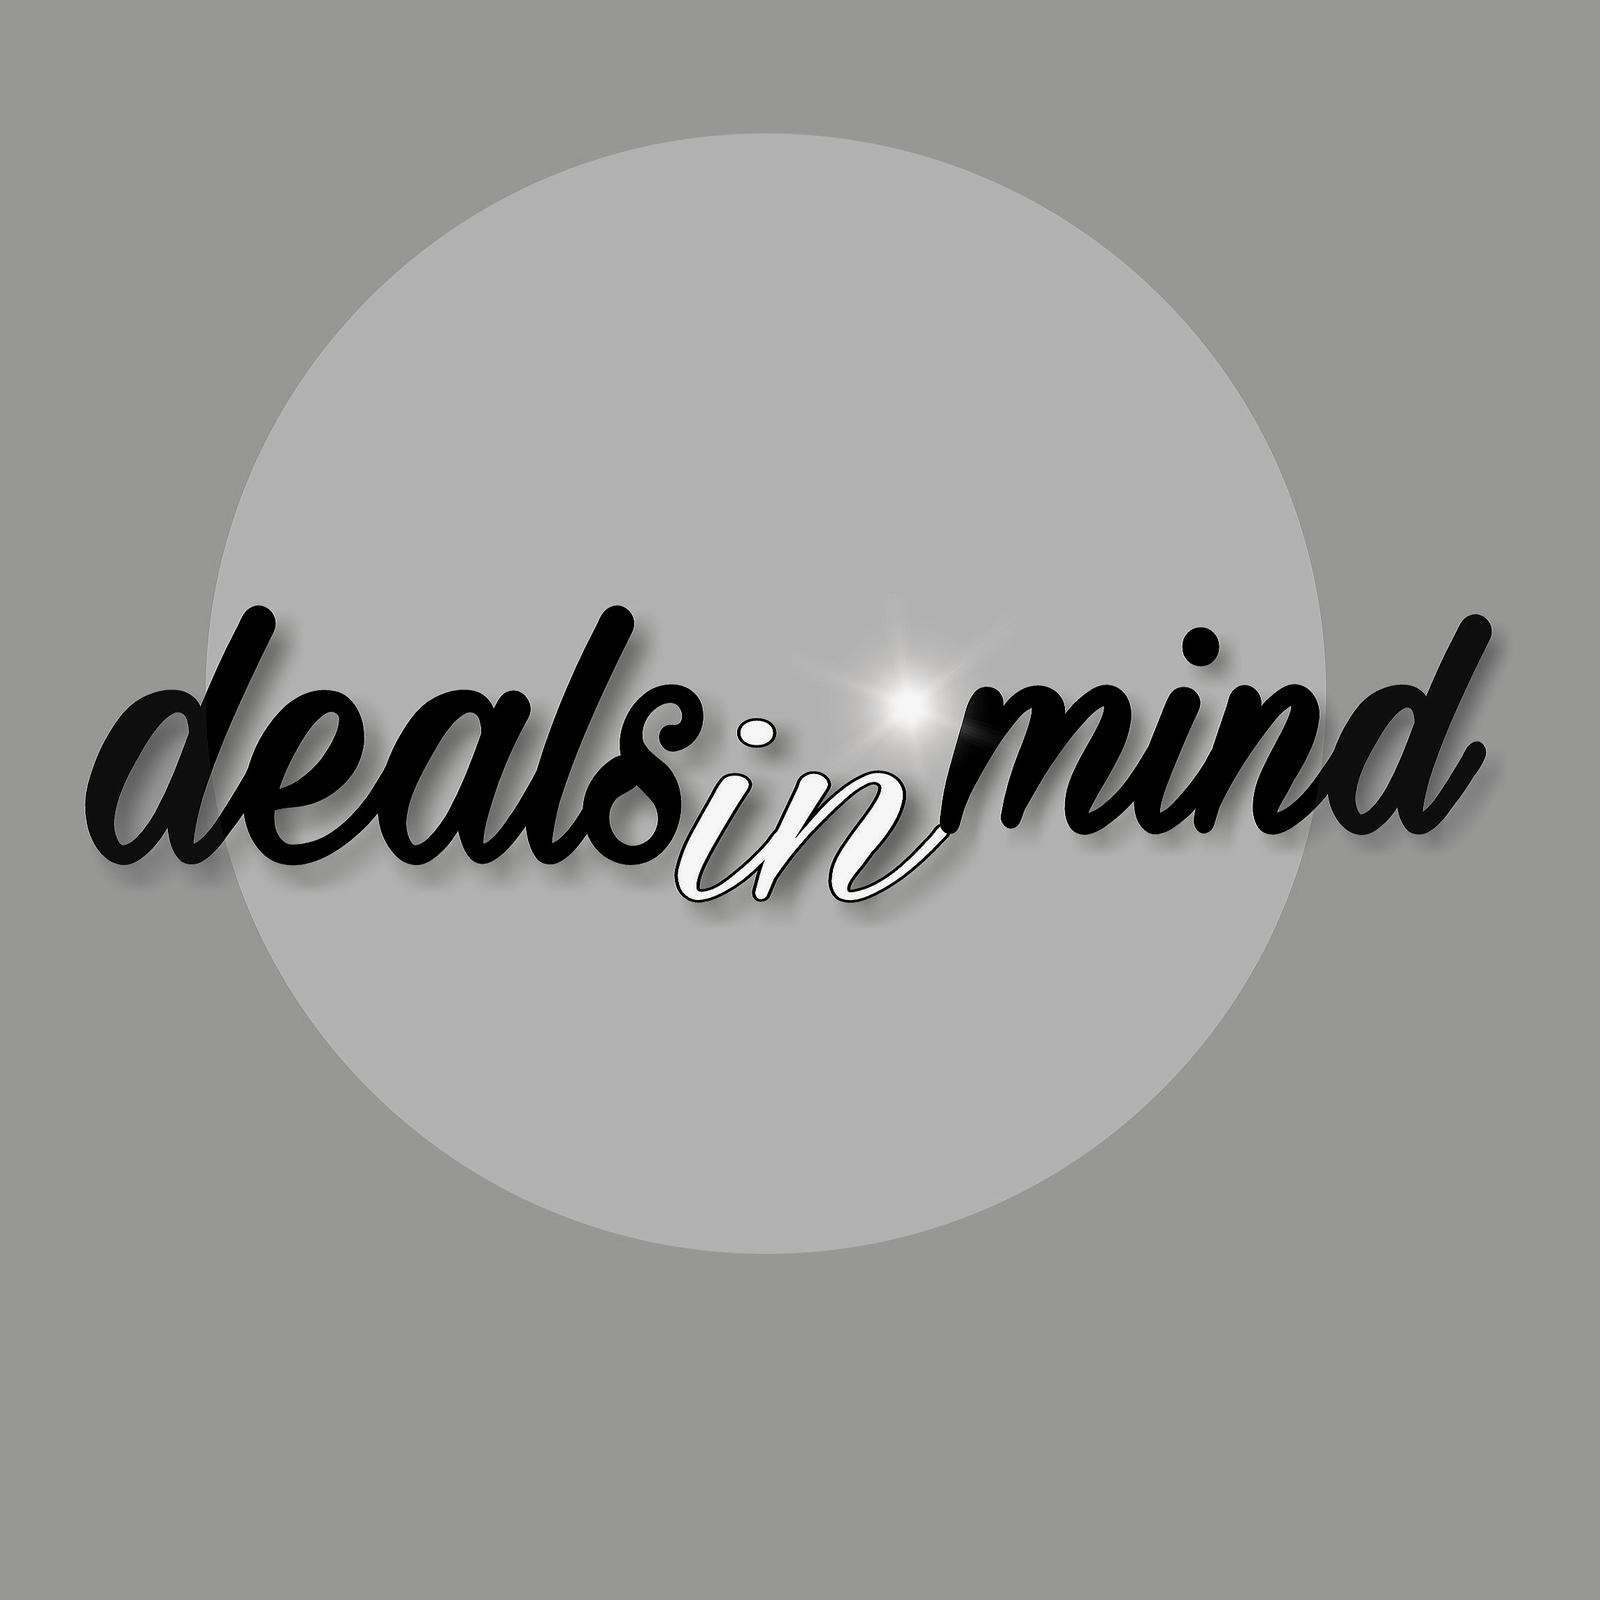 dealsinmind